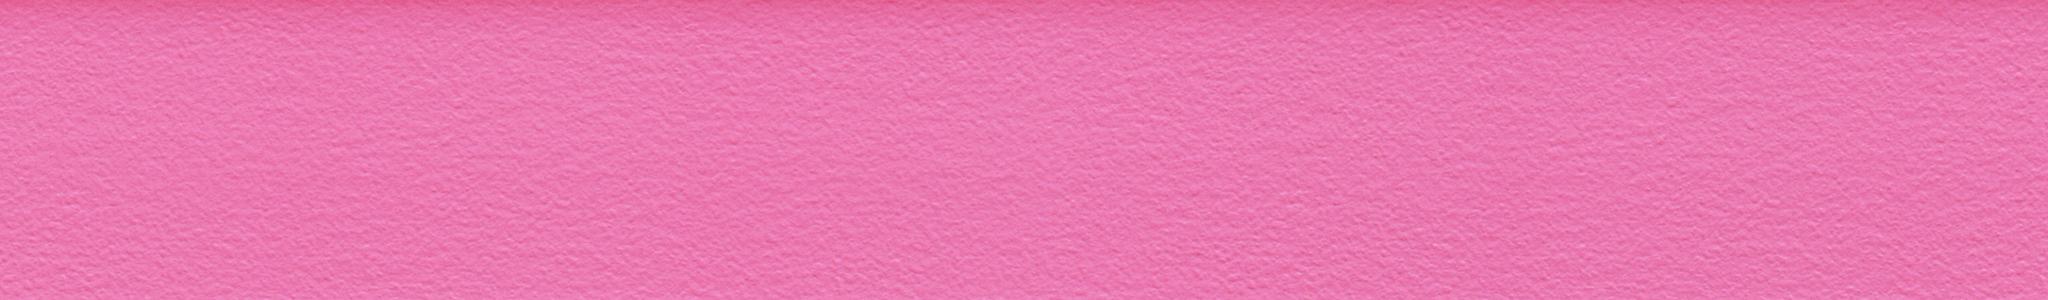 HU 130232 кромка ABS розовая жемчуг тонкая структура 107